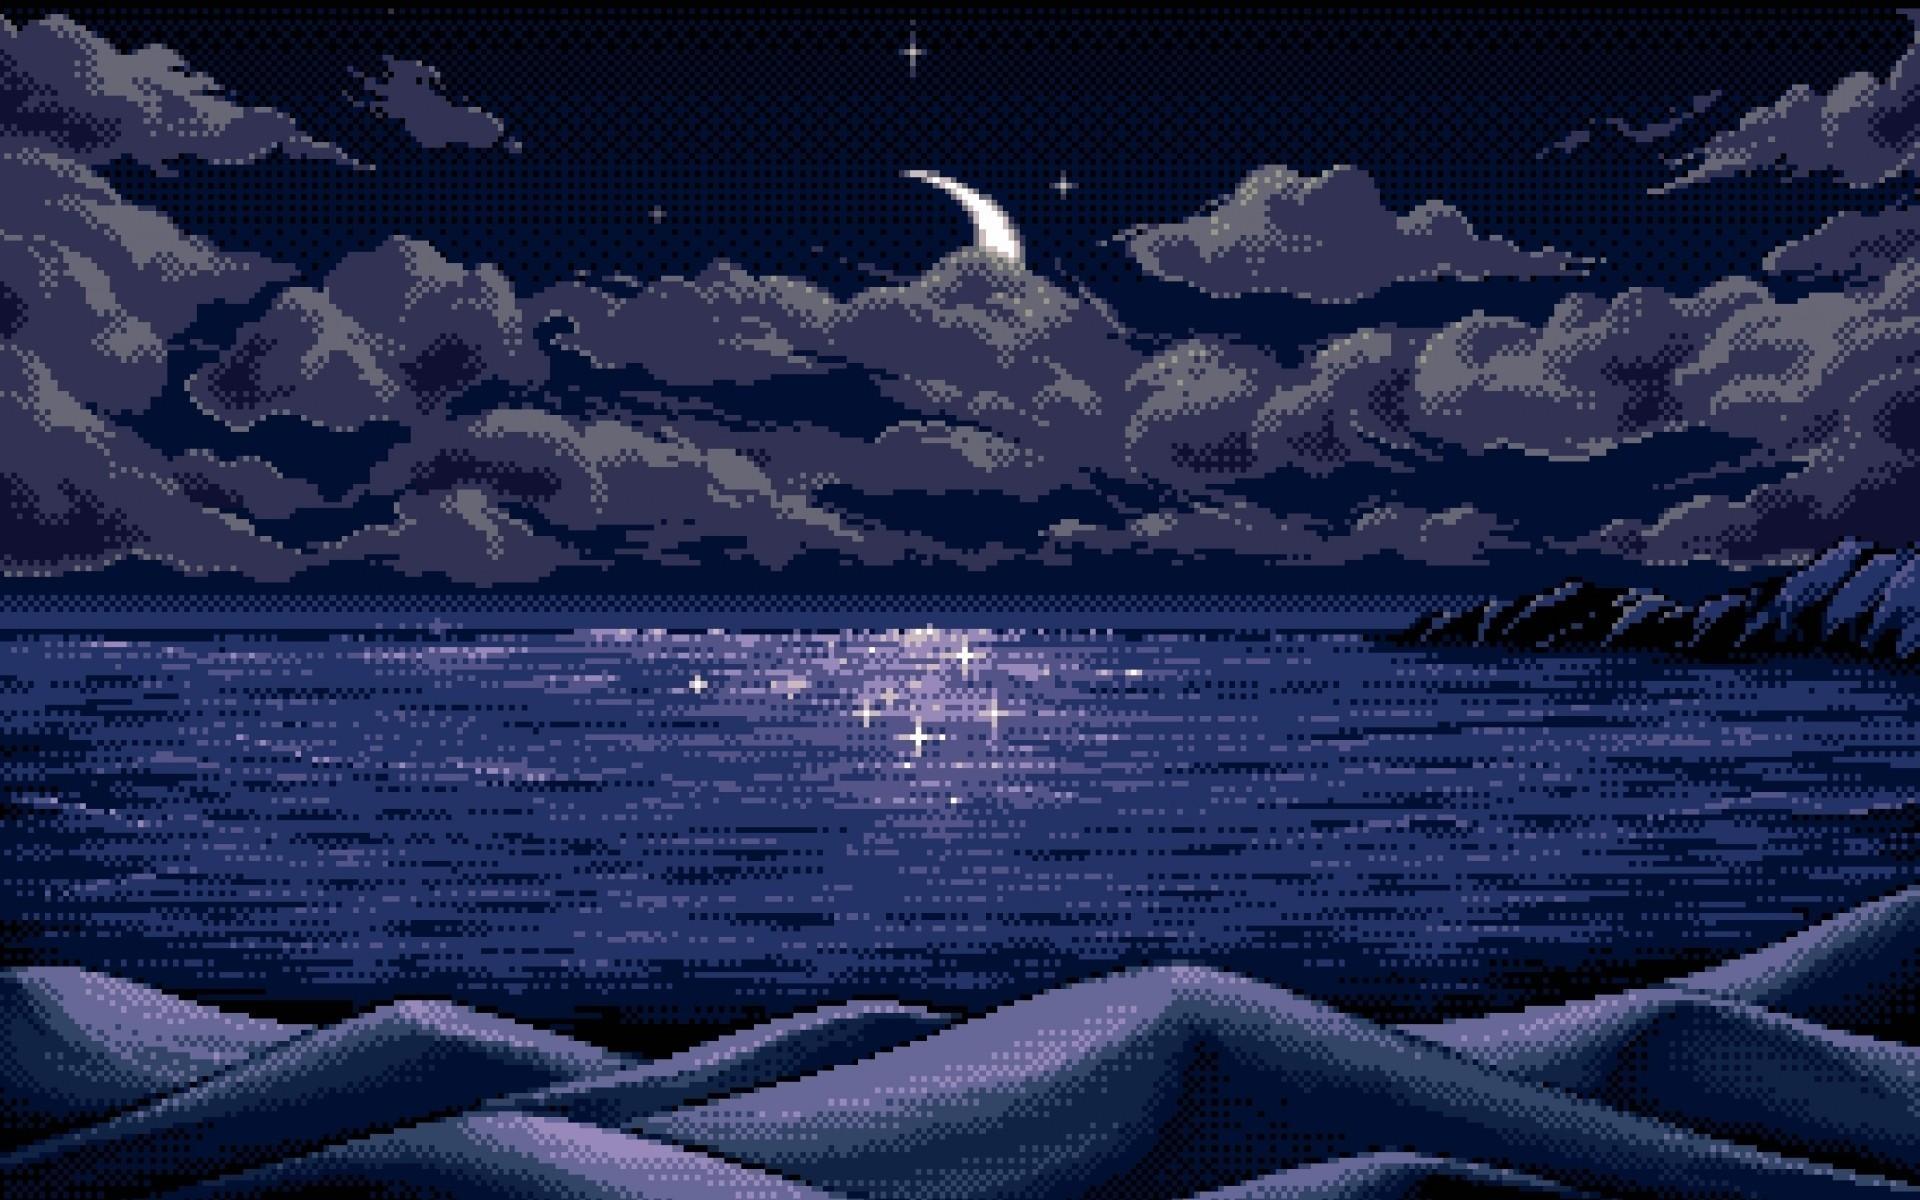 digital Art, Pixel Art, Pixels, Moon, Horizon, Blue, Reflection, Nature,  Sea, Clouds, Hills, Mountains, Night, Stars, Landscape Wallpapers HD /  Desktop and …